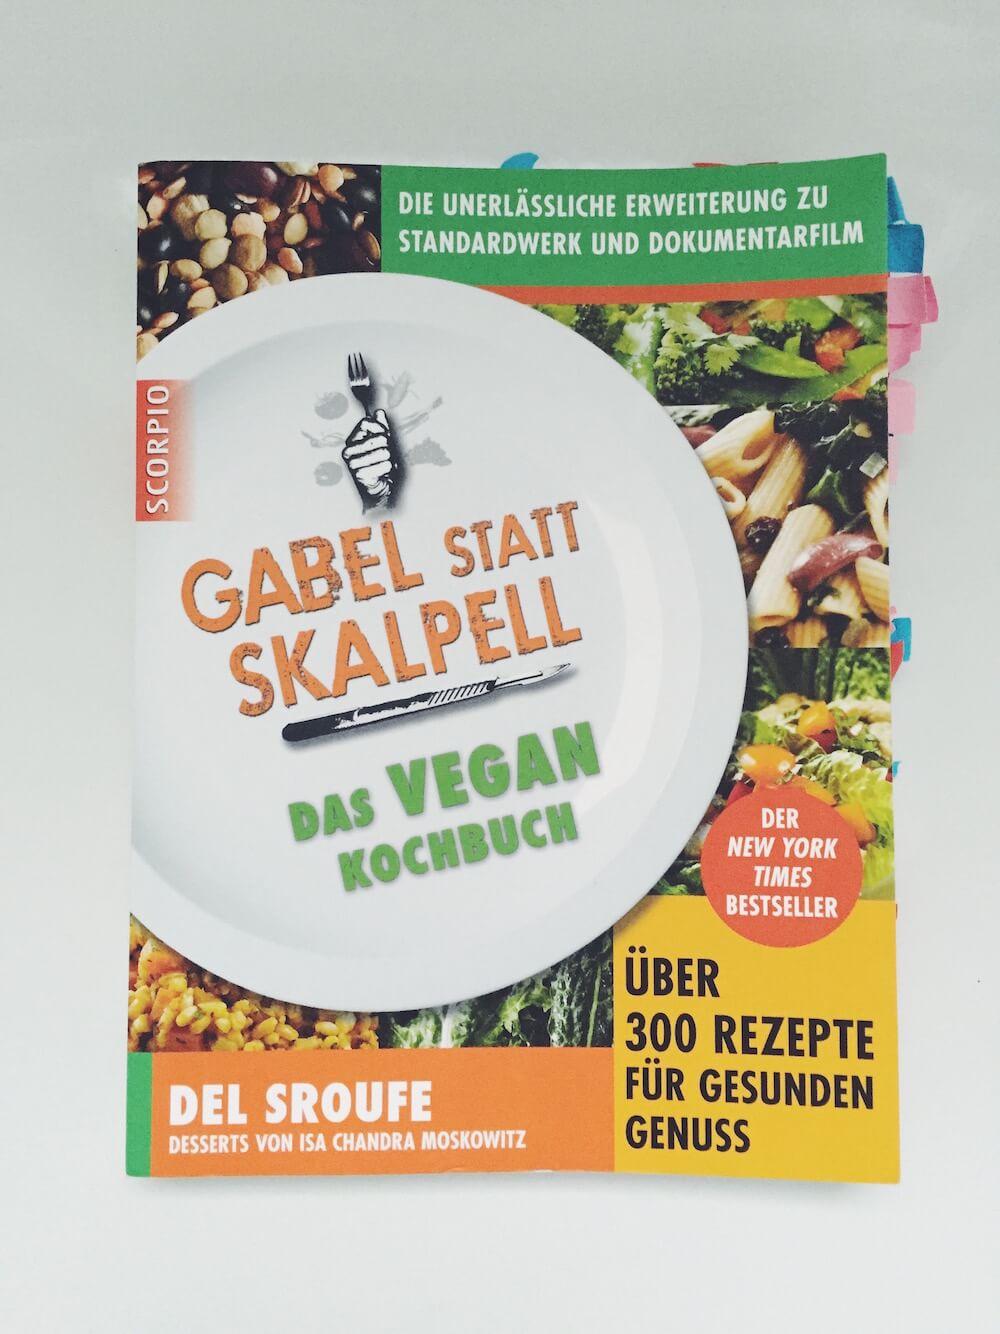 Gabel statt Skalpell – Das VEGAN Kochbuch